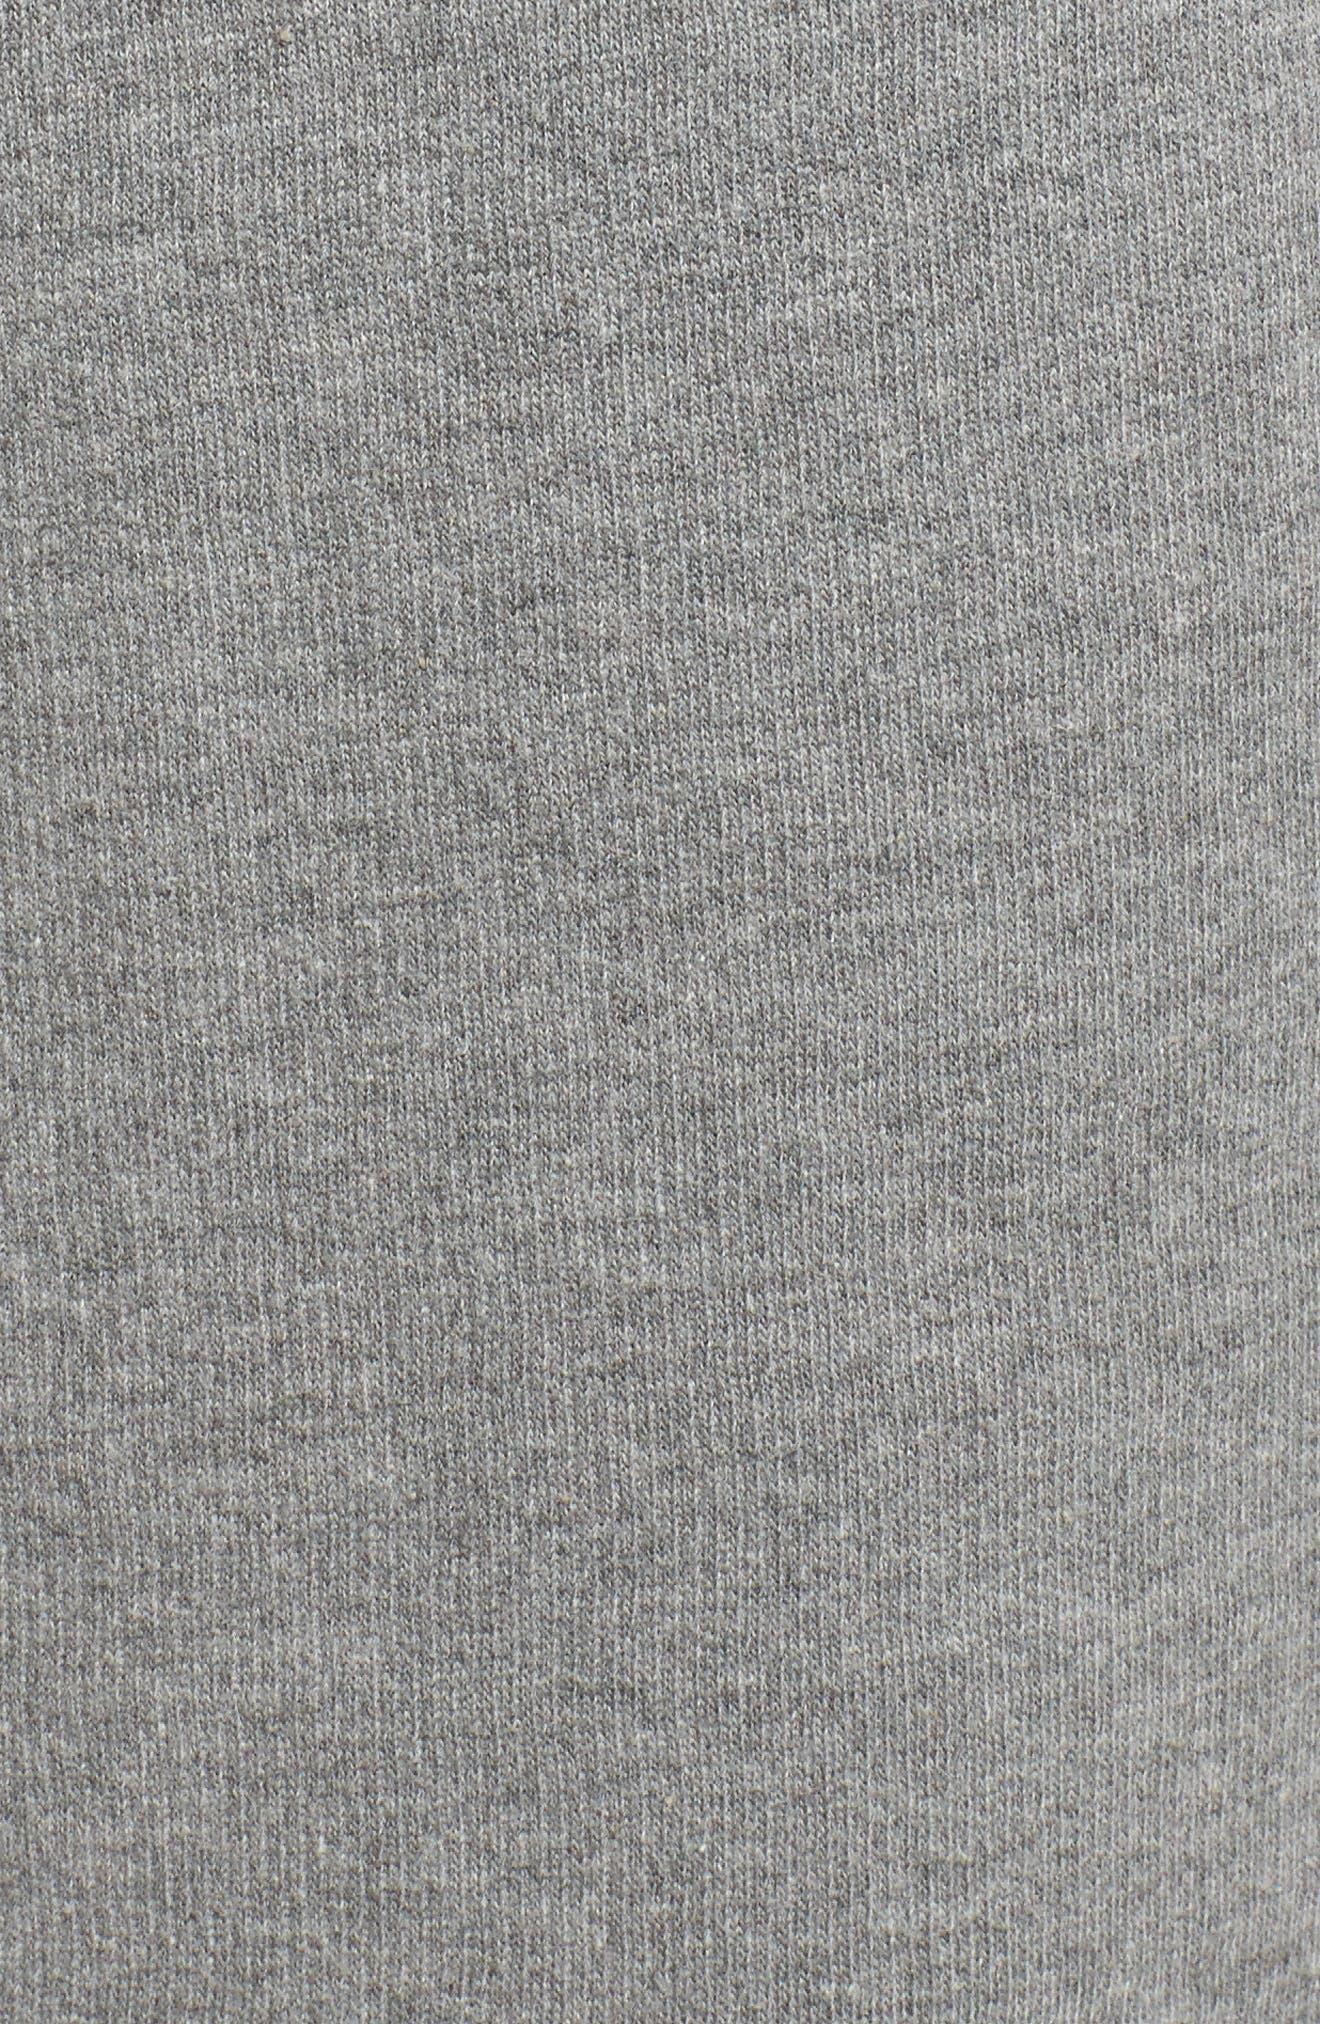 Brunette Jogger Pants,                             Alternate thumbnail 5, color,                             Heather Grey Blonde